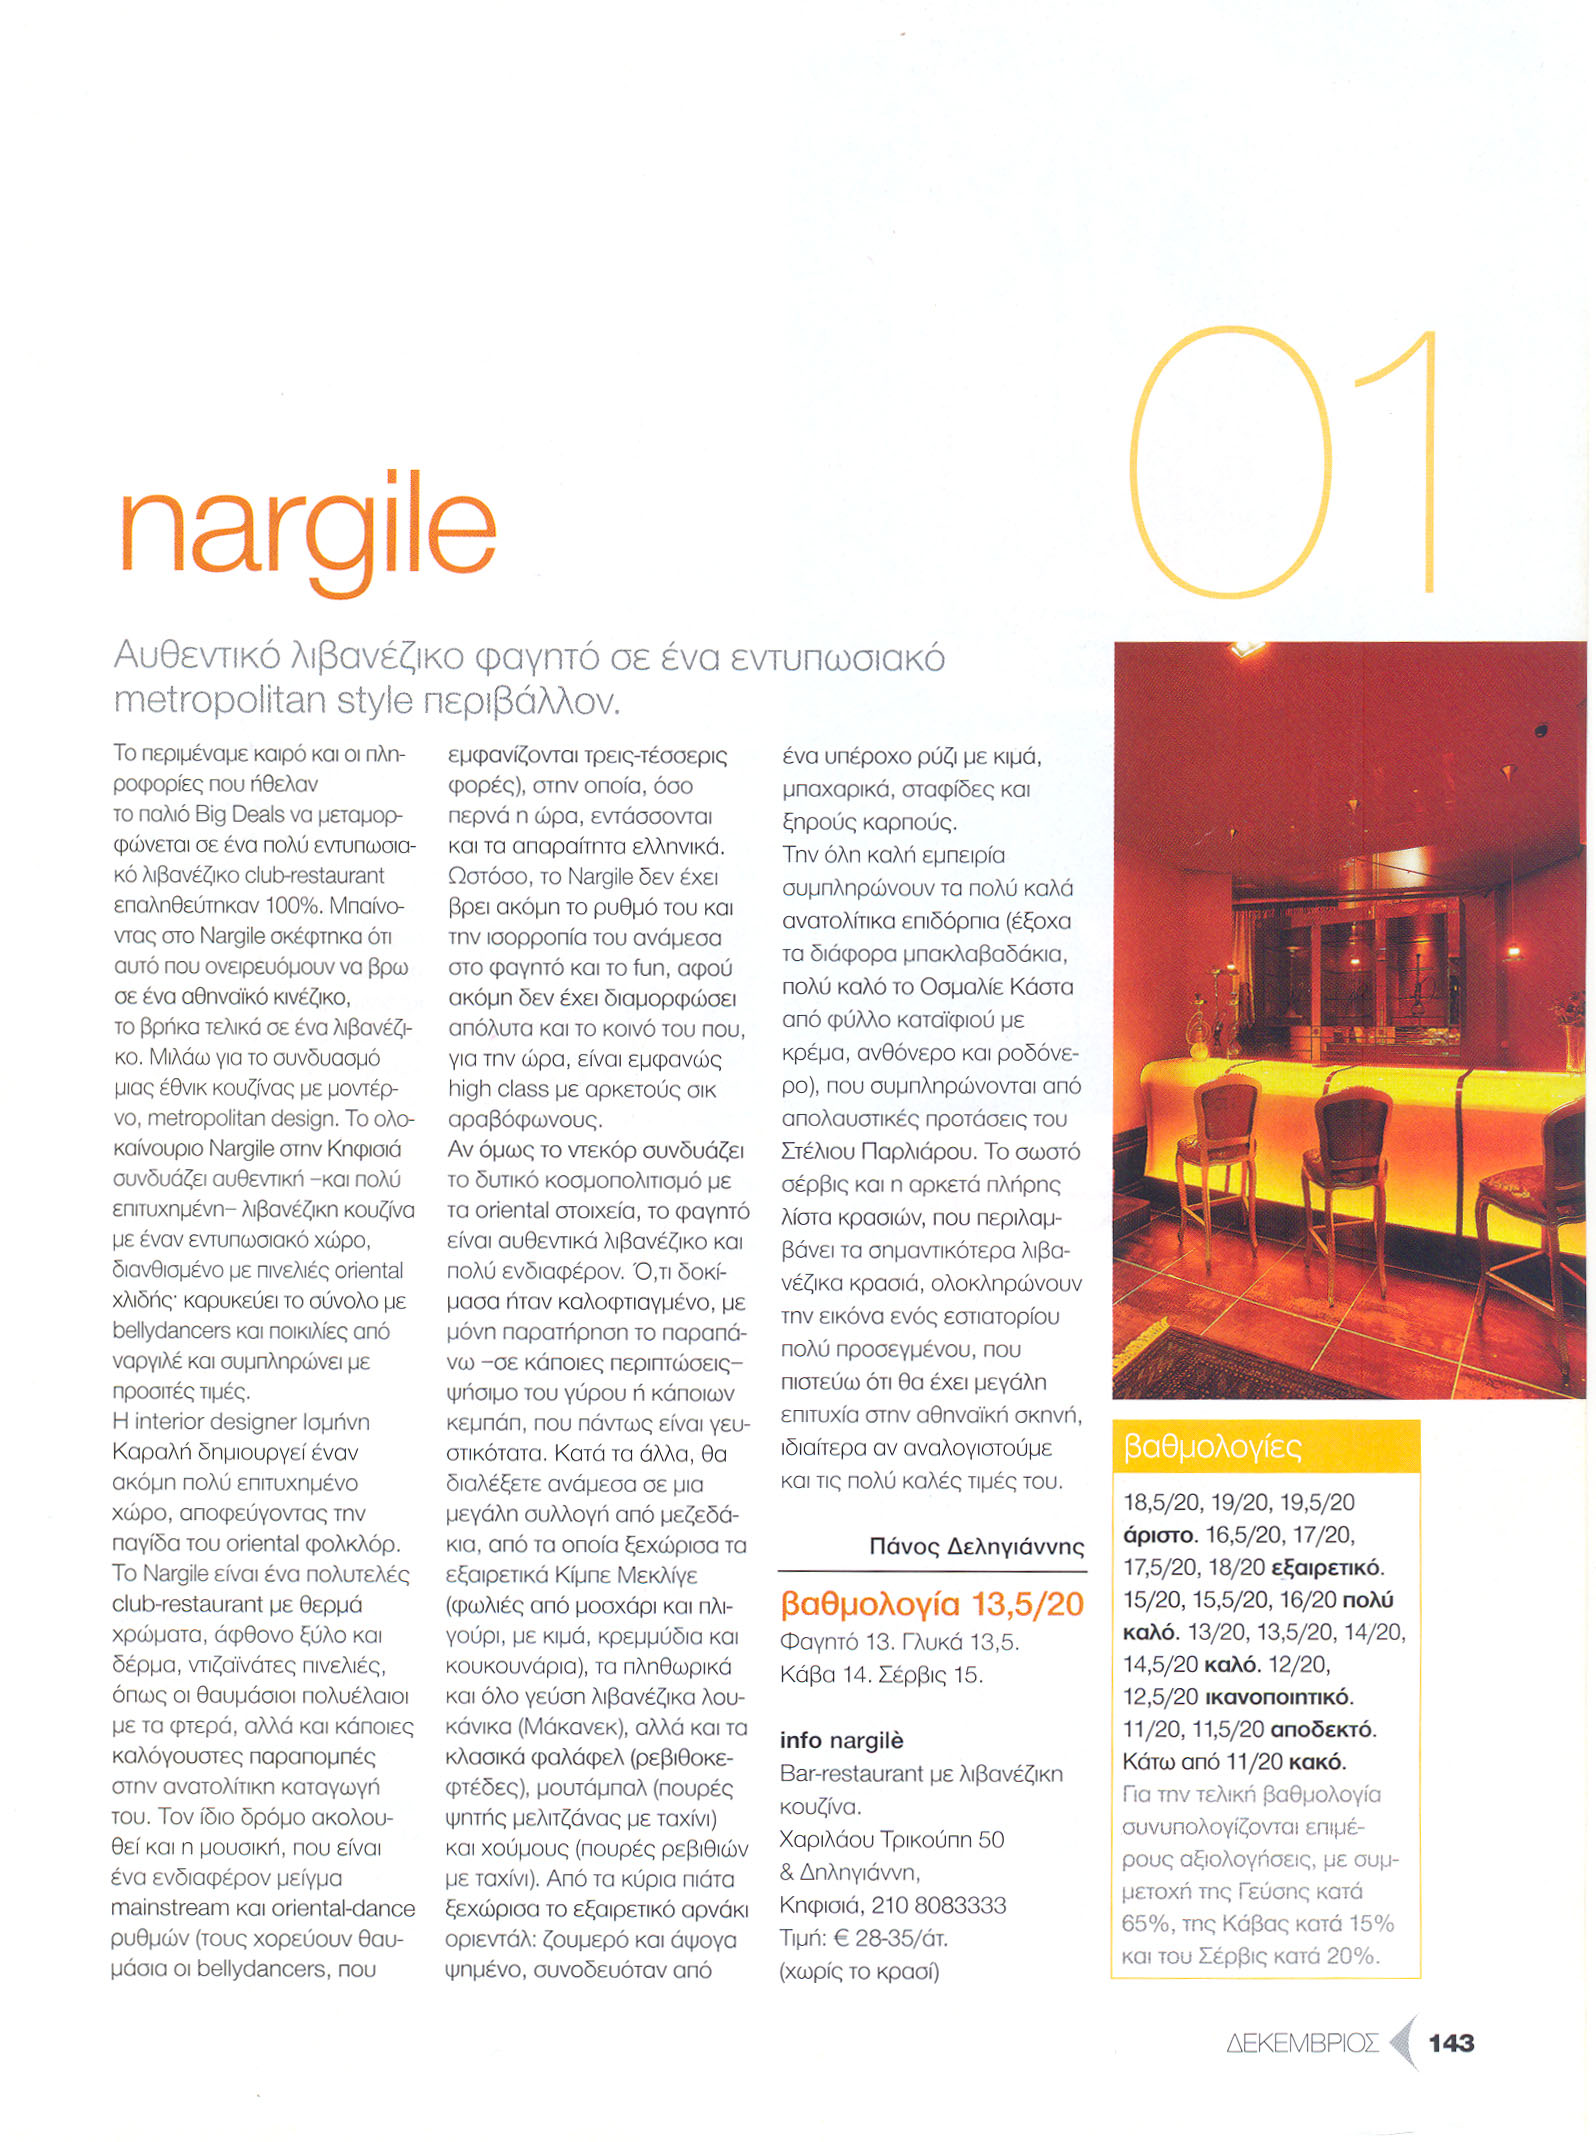 narghile9.jpg